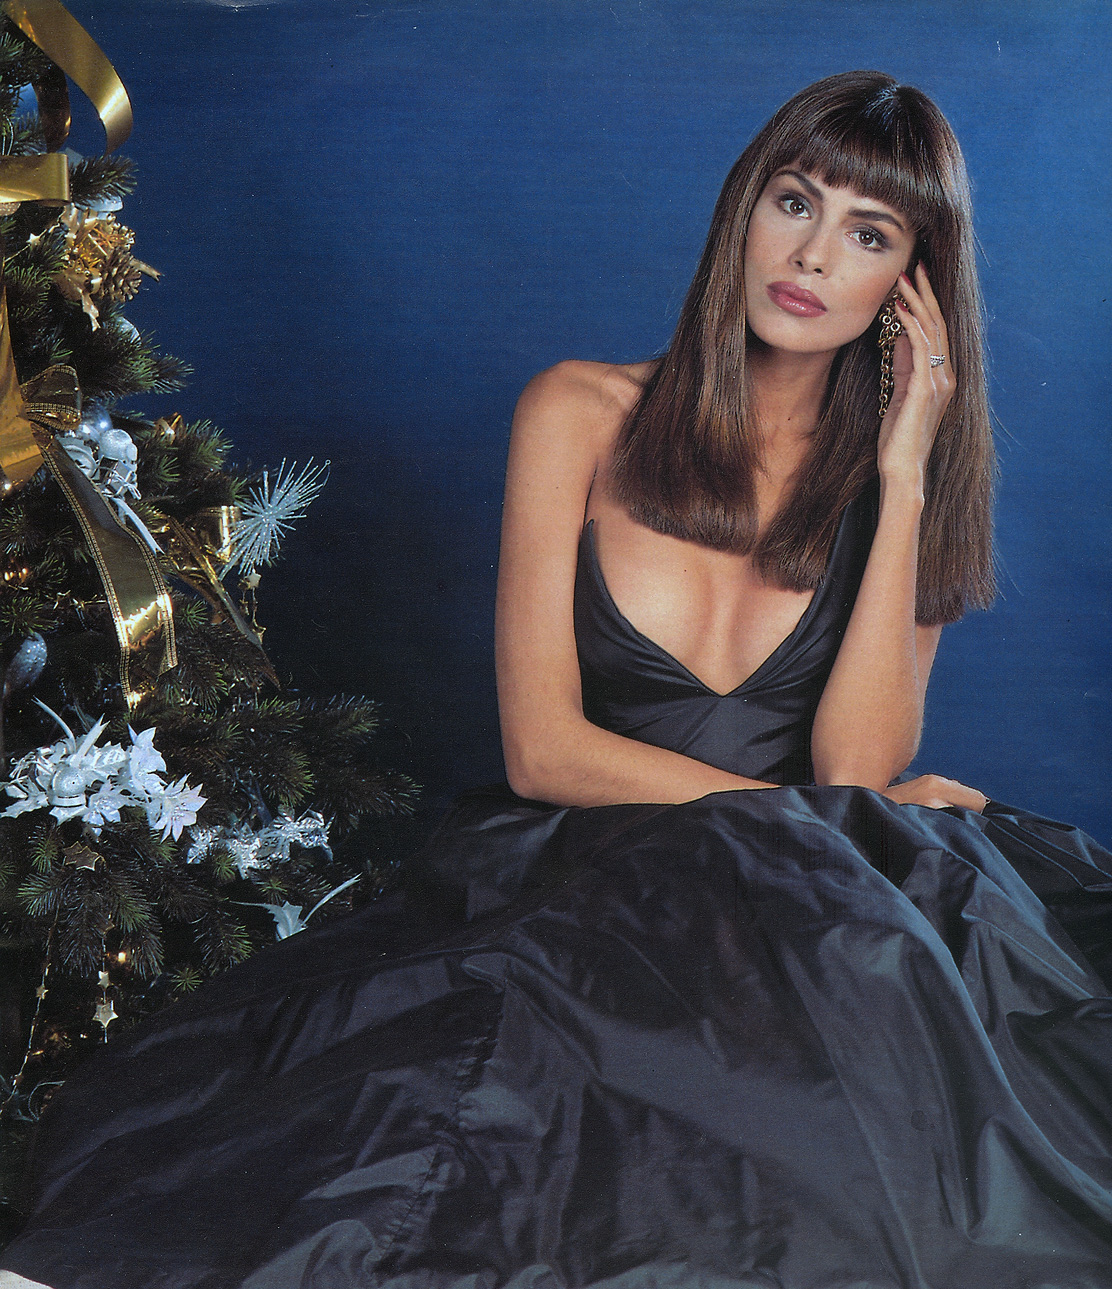 Jacqueline de la Vega